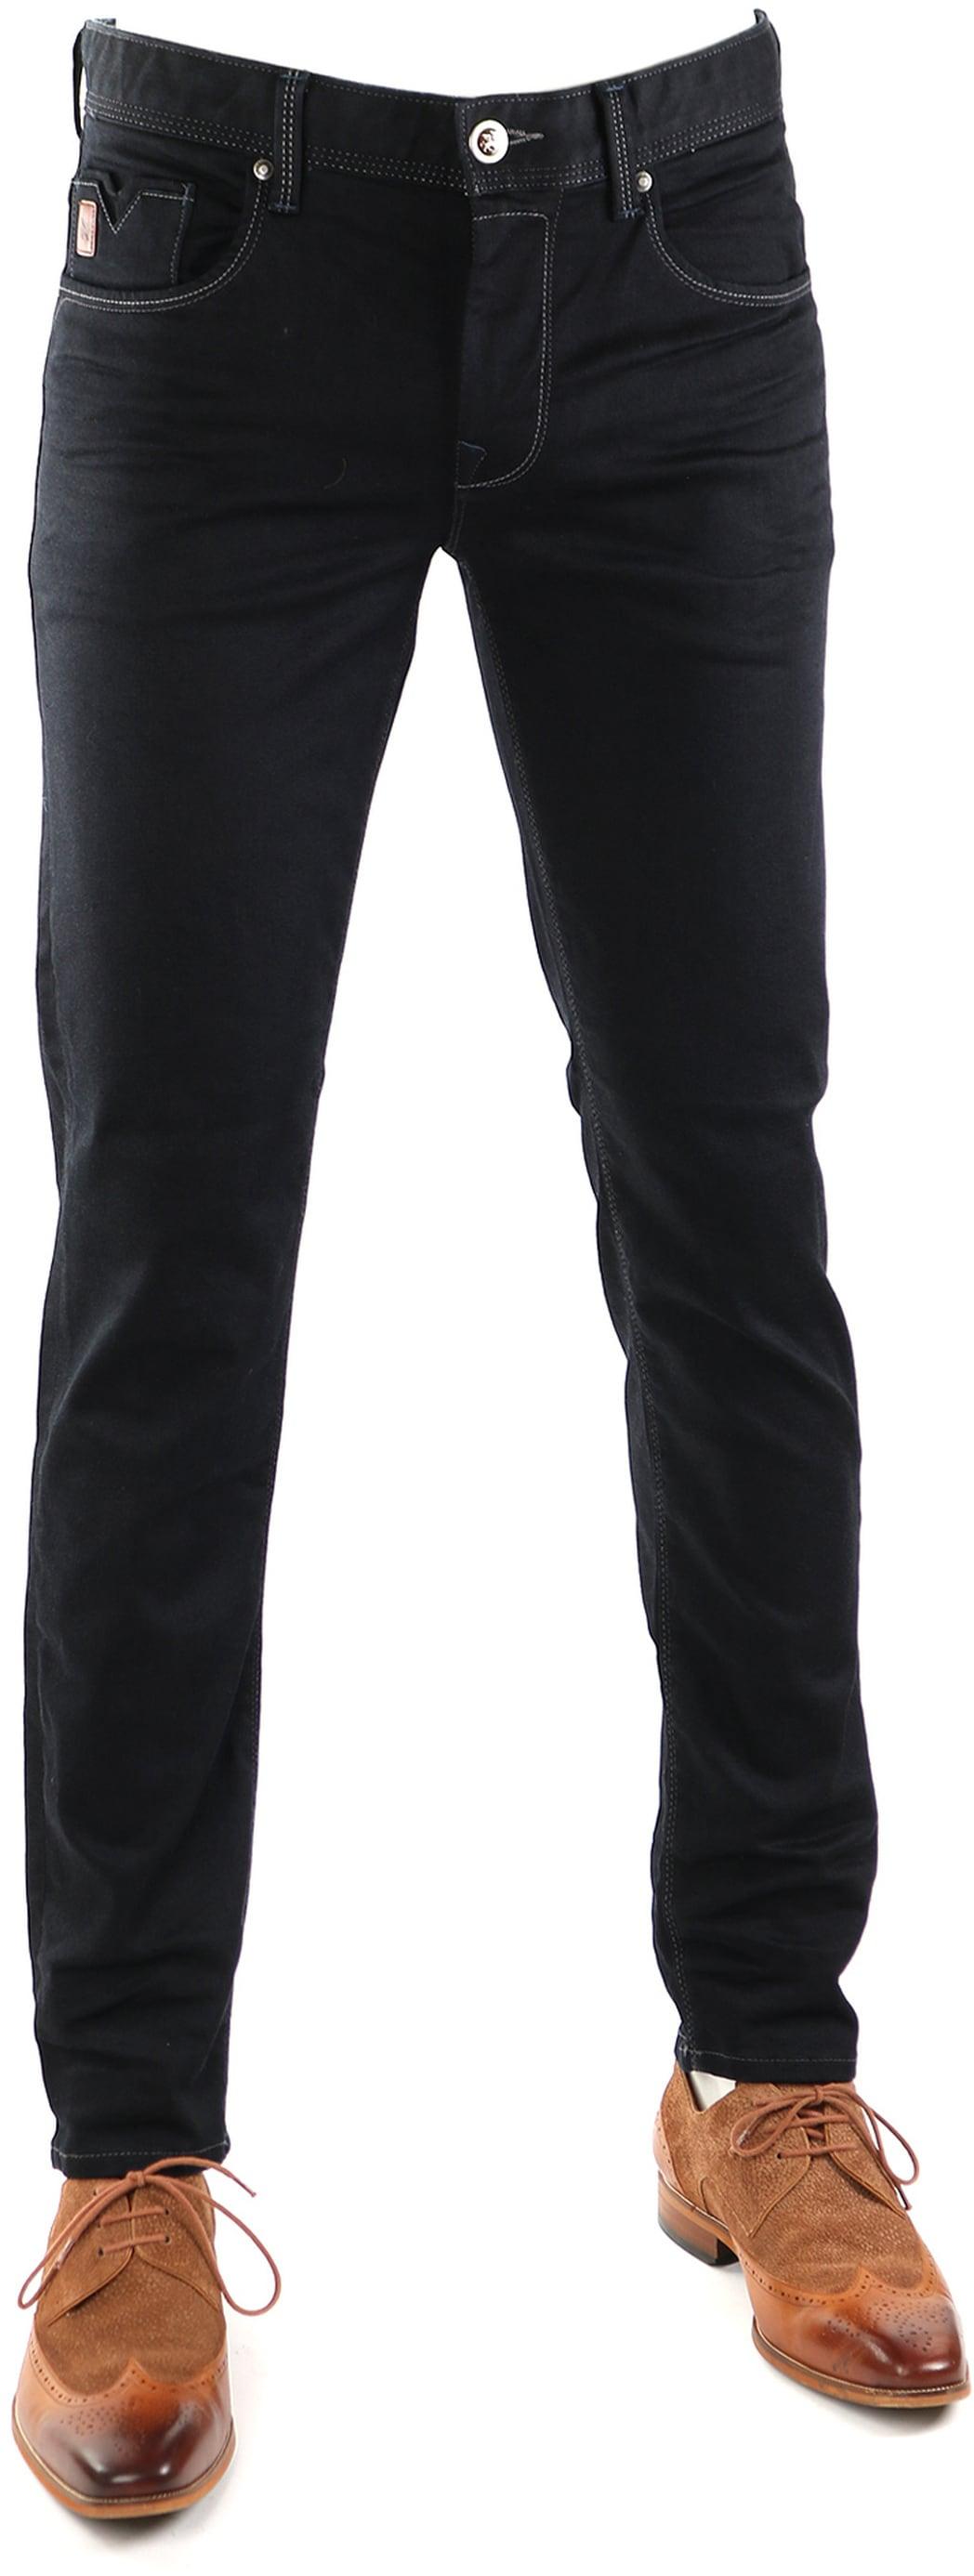 Vanguard V7 Slim Jeans Stretch DCD foto 0